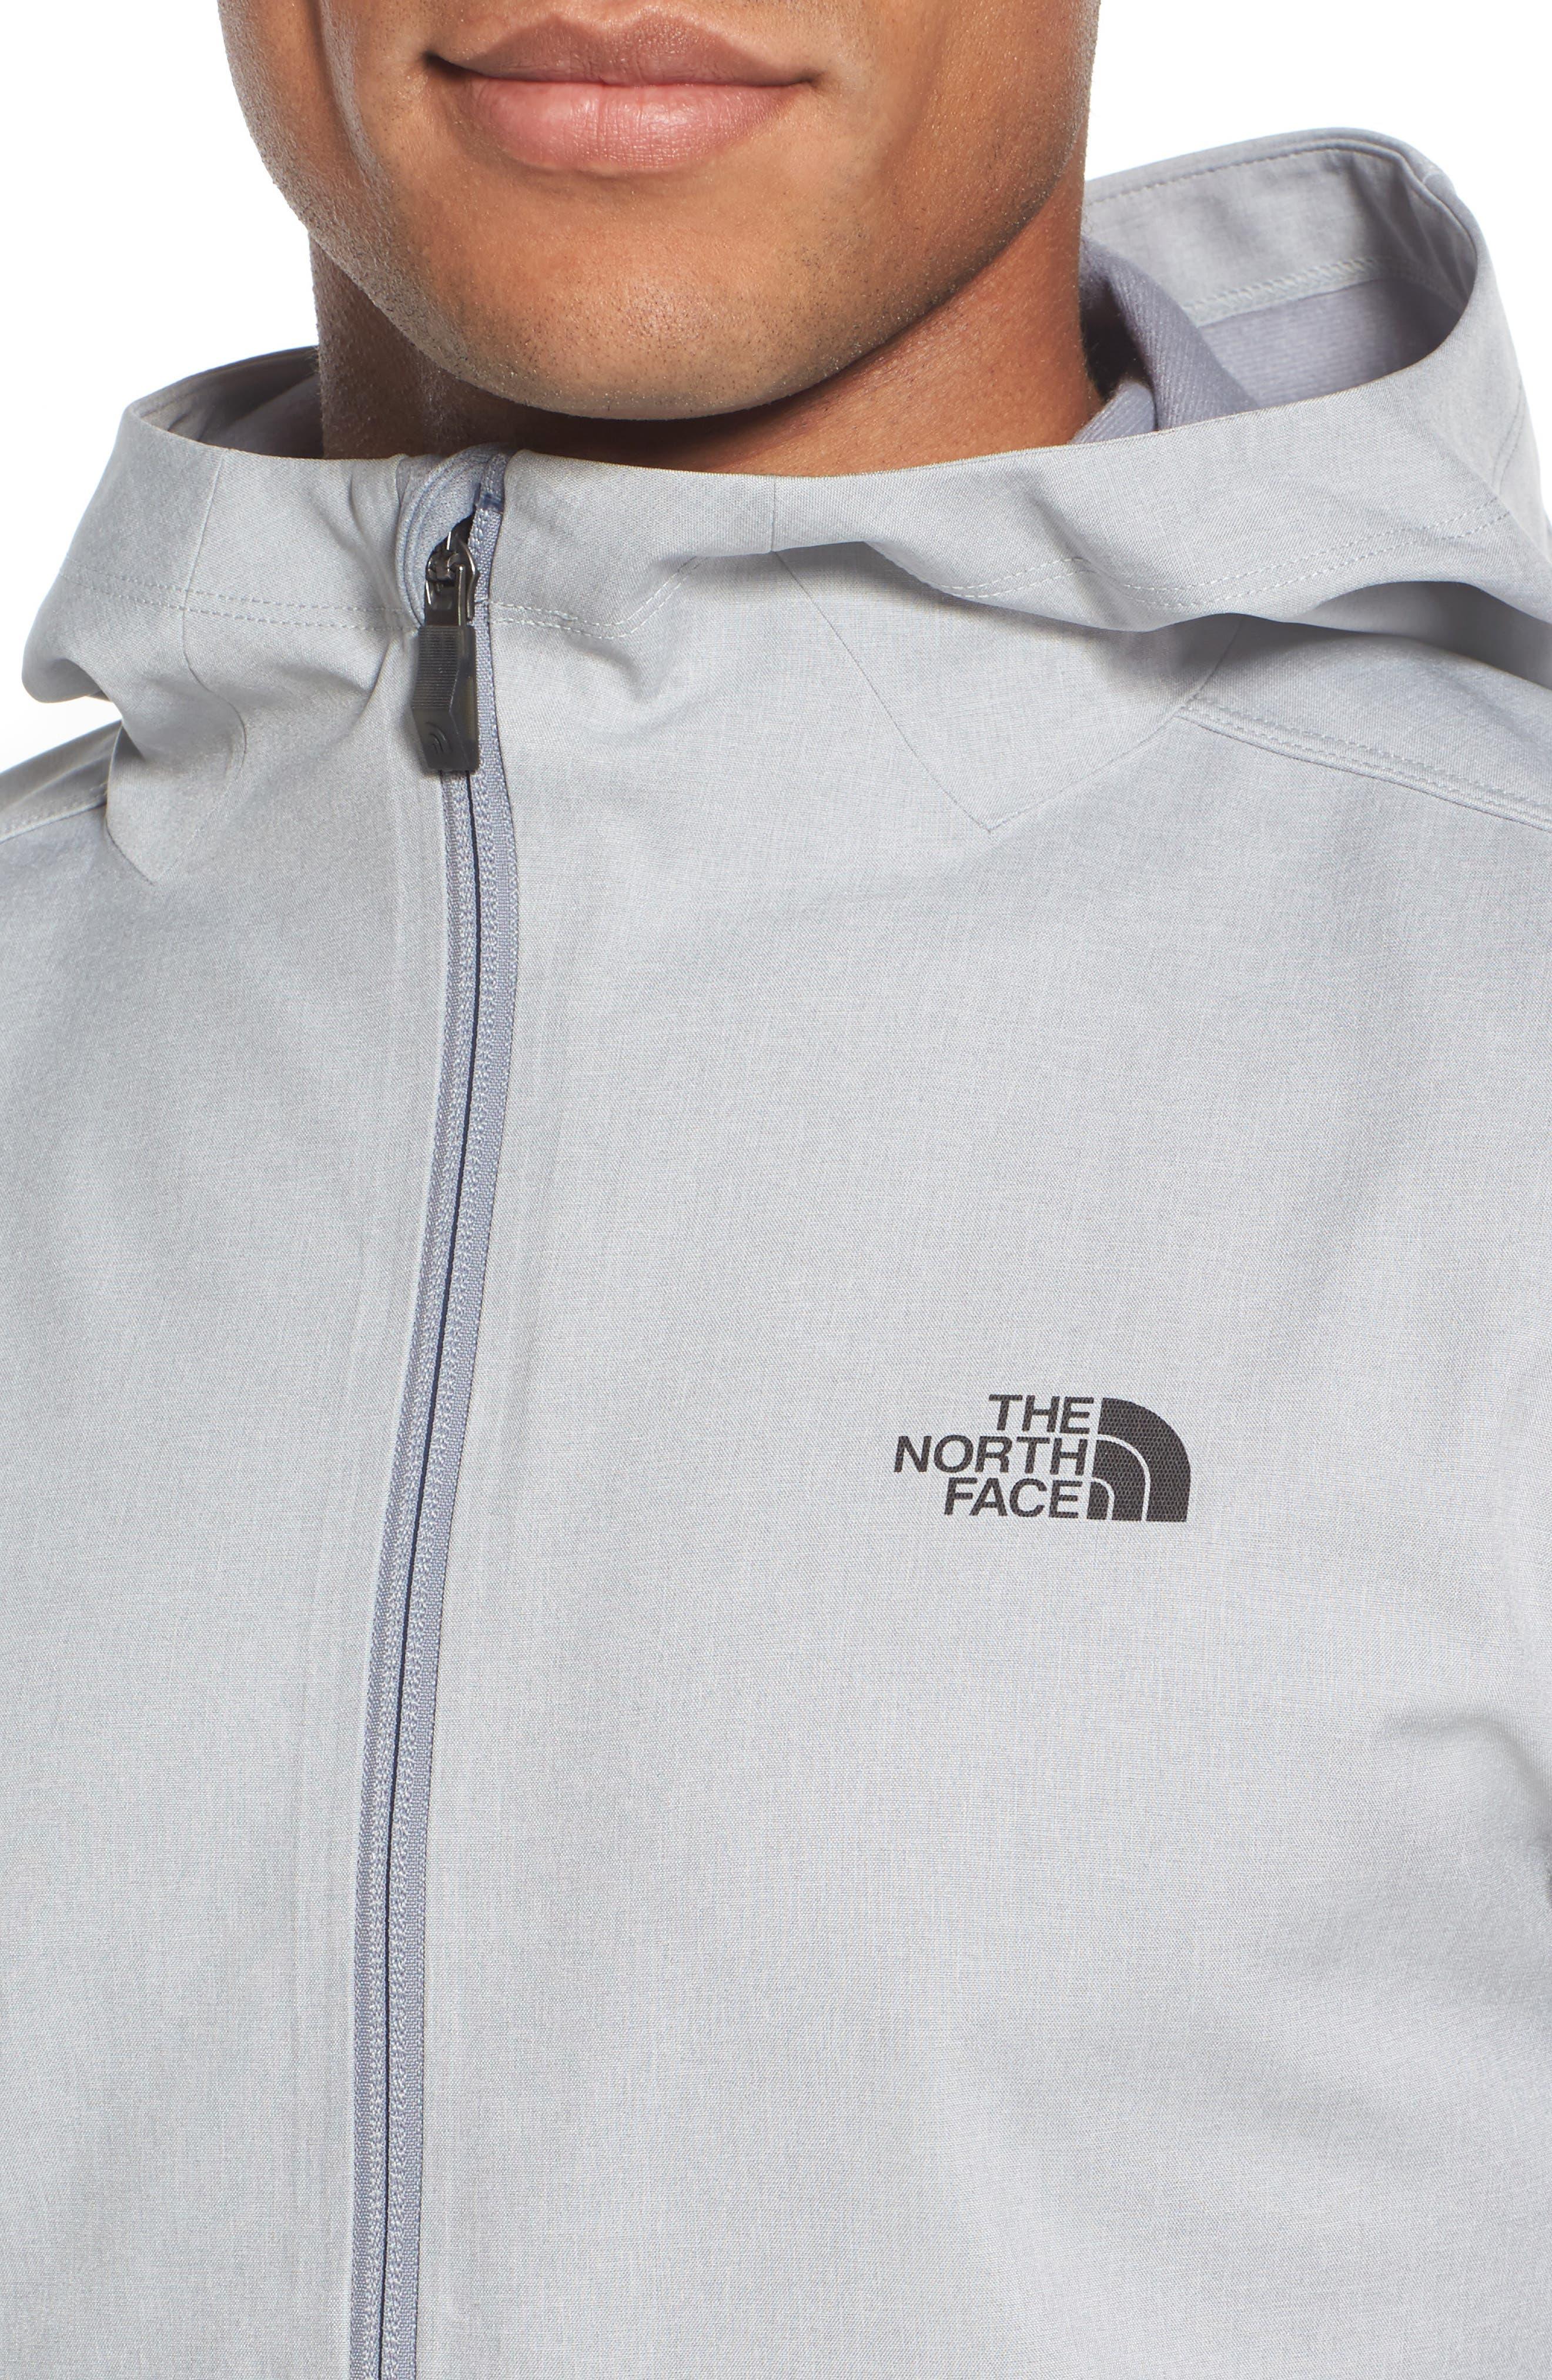 'Kilowatt' Hooded Jacket,                             Alternate thumbnail 4, color,                             Tnf Light Grey Heather